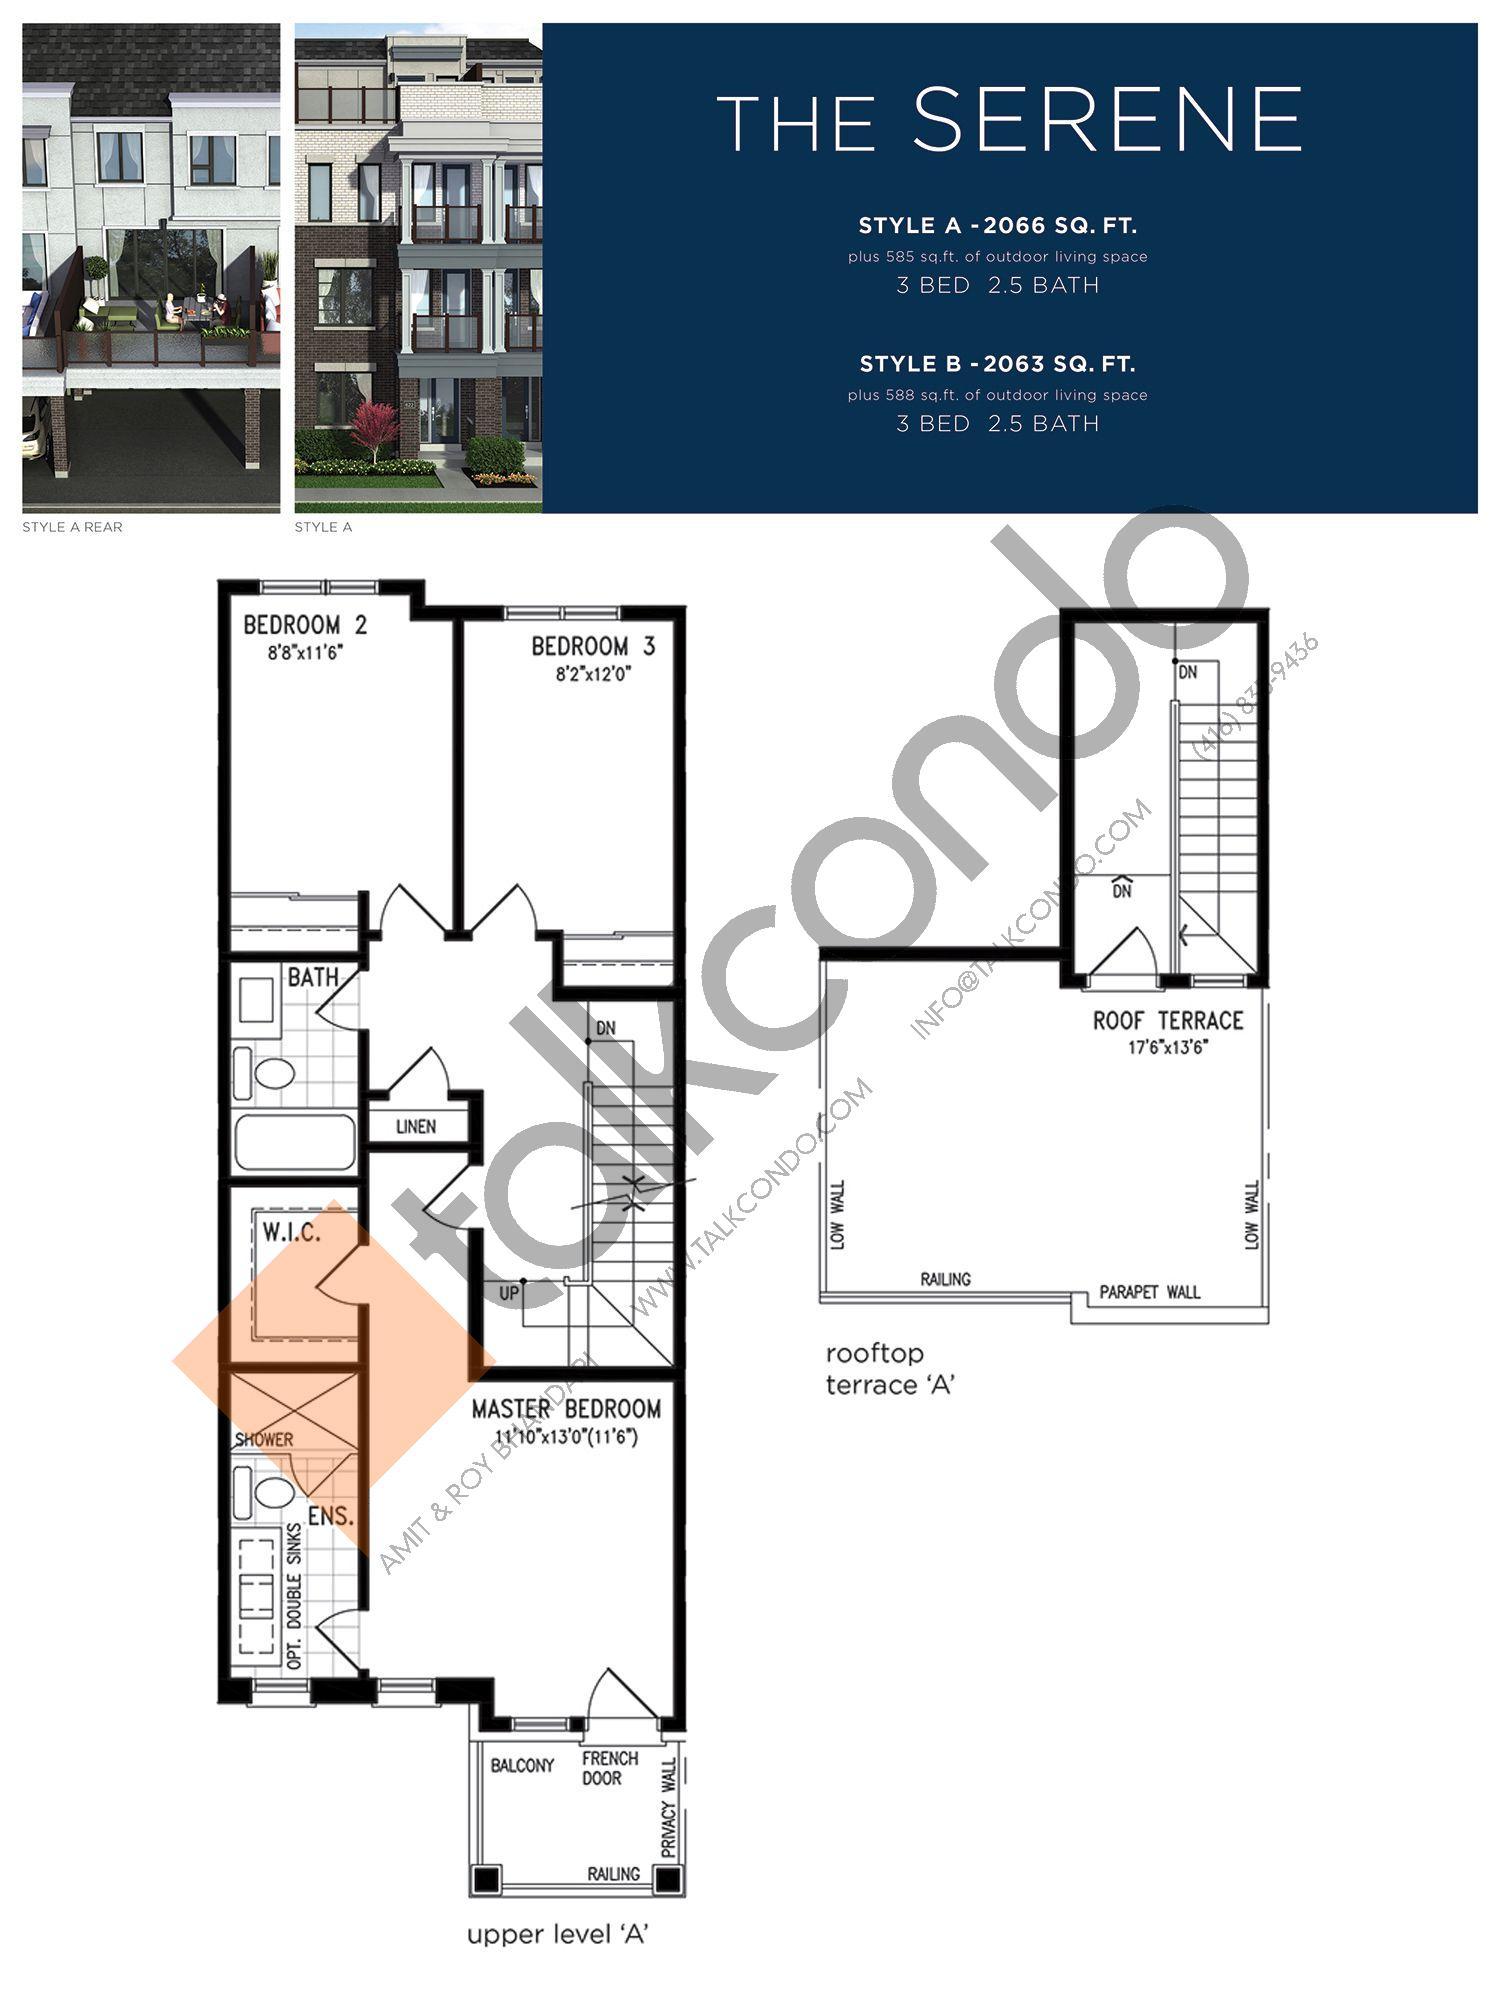 The Serene (3/3) Floor Plan at Lake Breeze - 2066 sq.ft